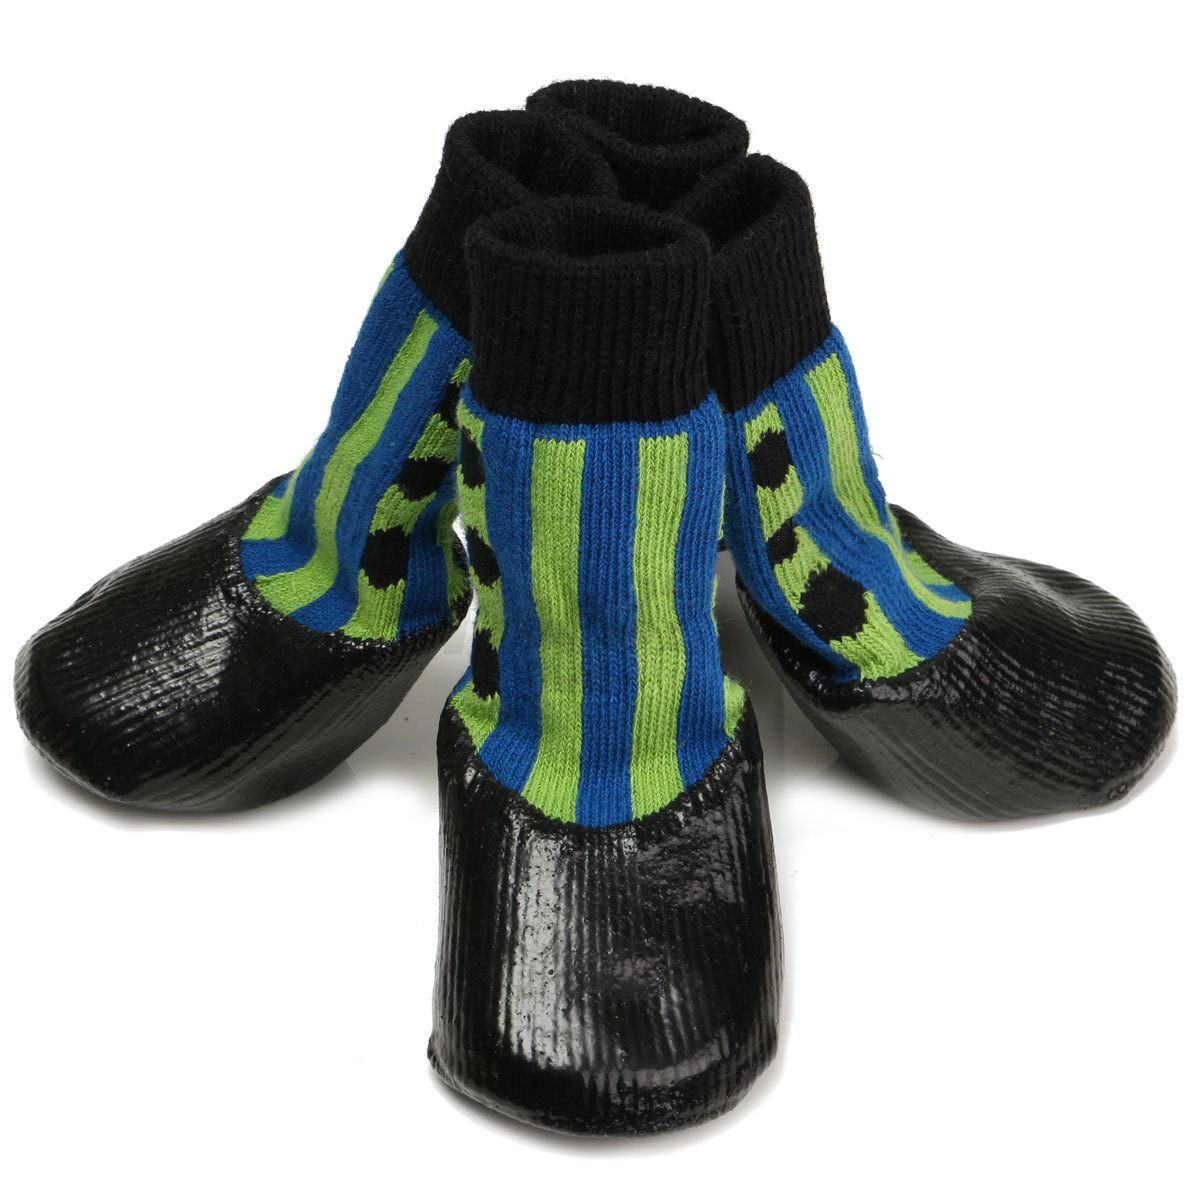 Pet Dog Waterproof Shoes Socks Anti Slip Boot Shoes Rain